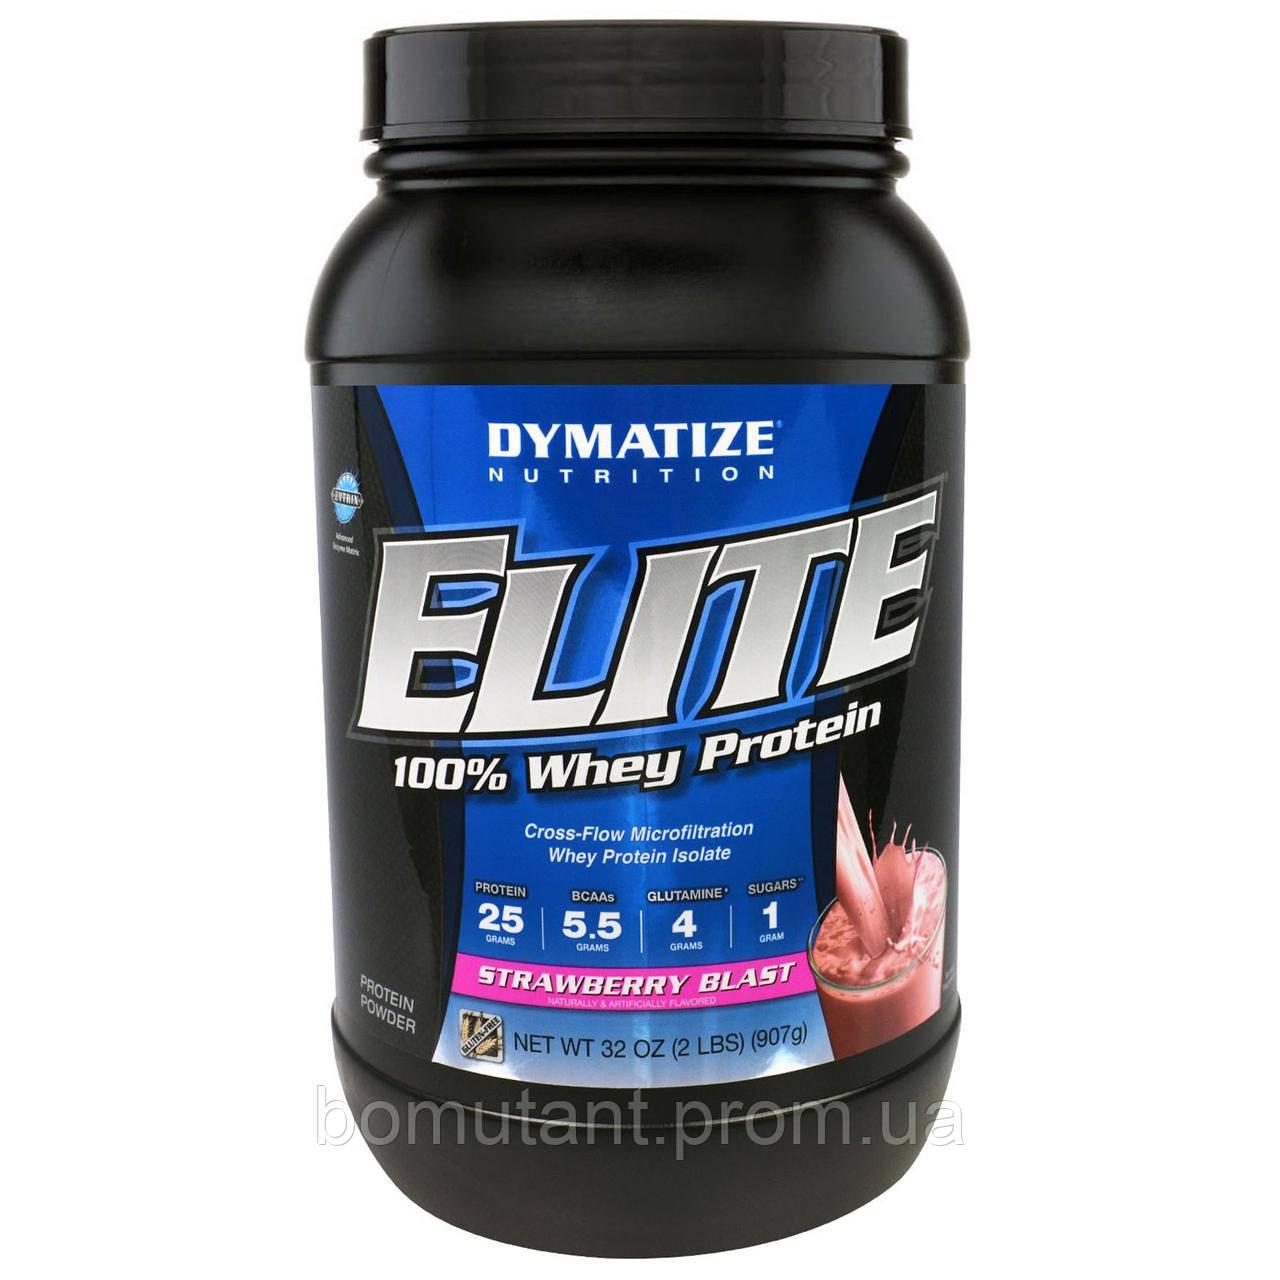 Elite Whey Protein Isolate 907 гр взрывная клубника Dymatize